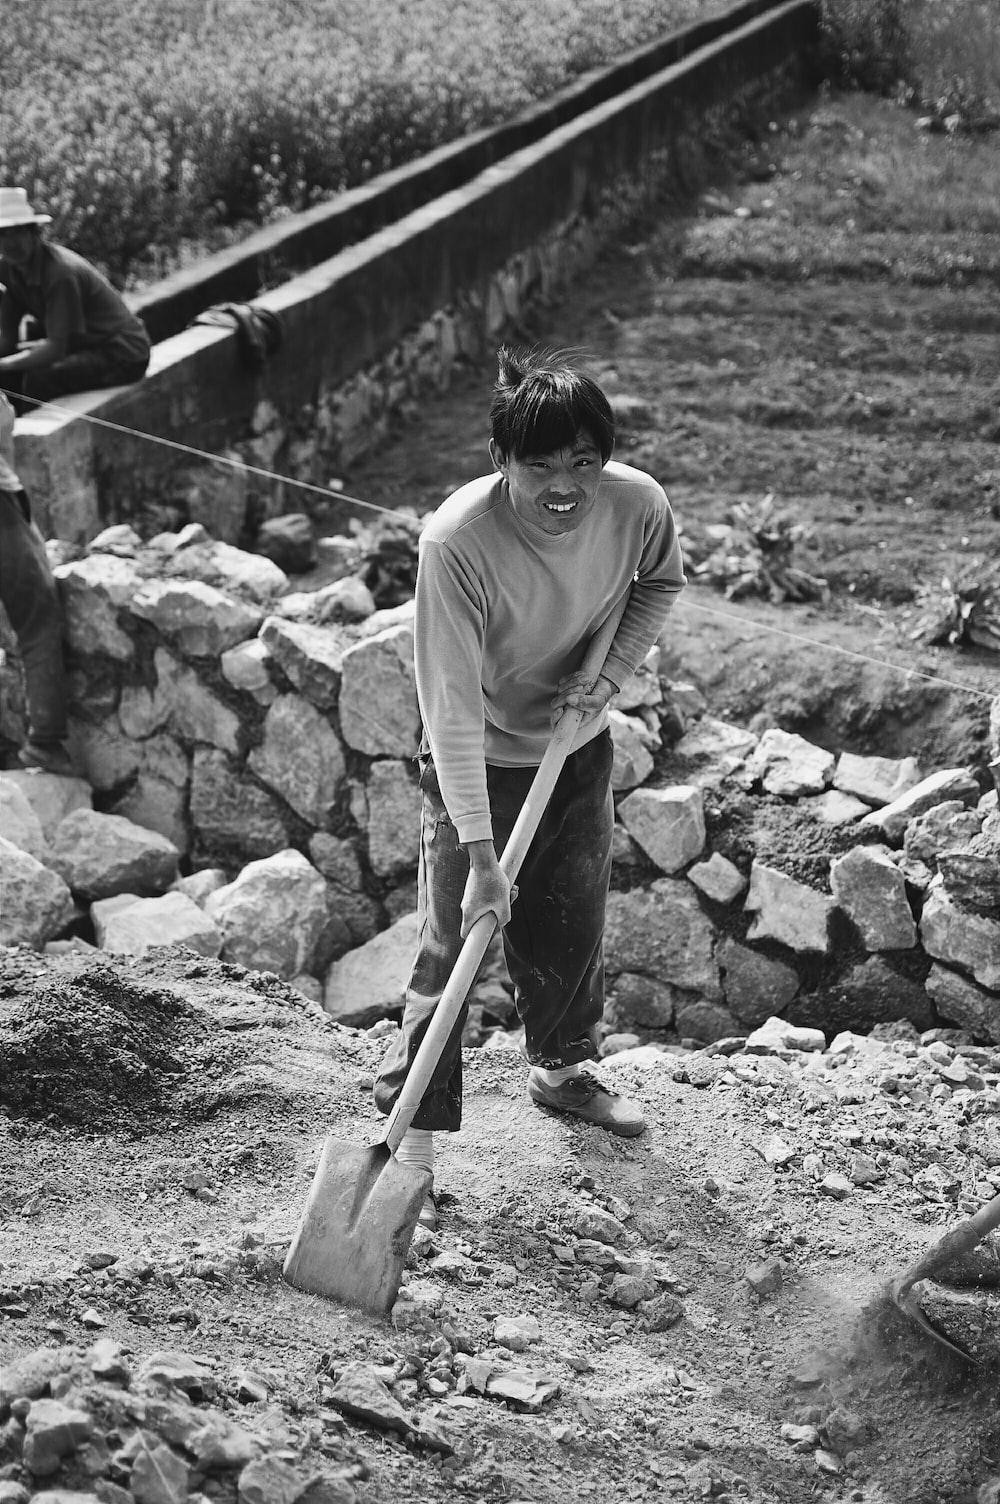 grayscale photo of man holding shovel